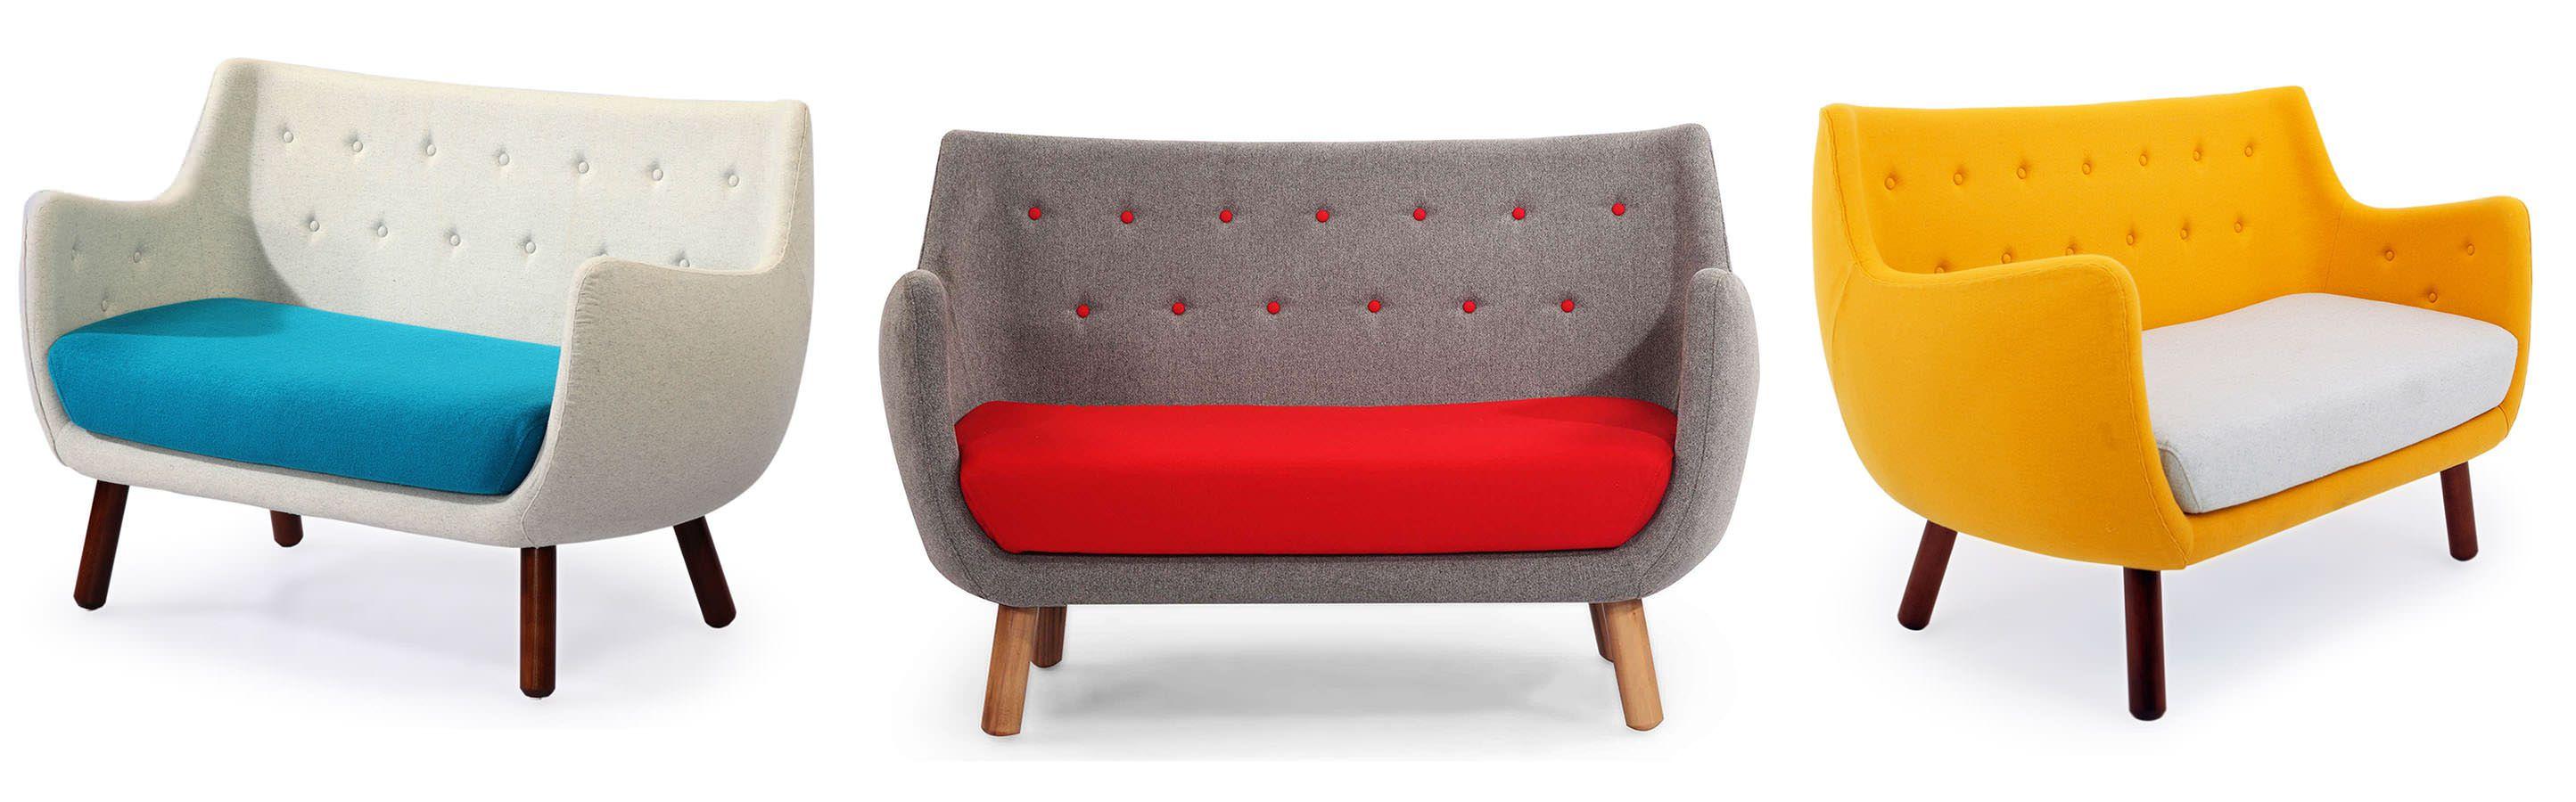 Poet Parlor Mid Century Modern Sofa